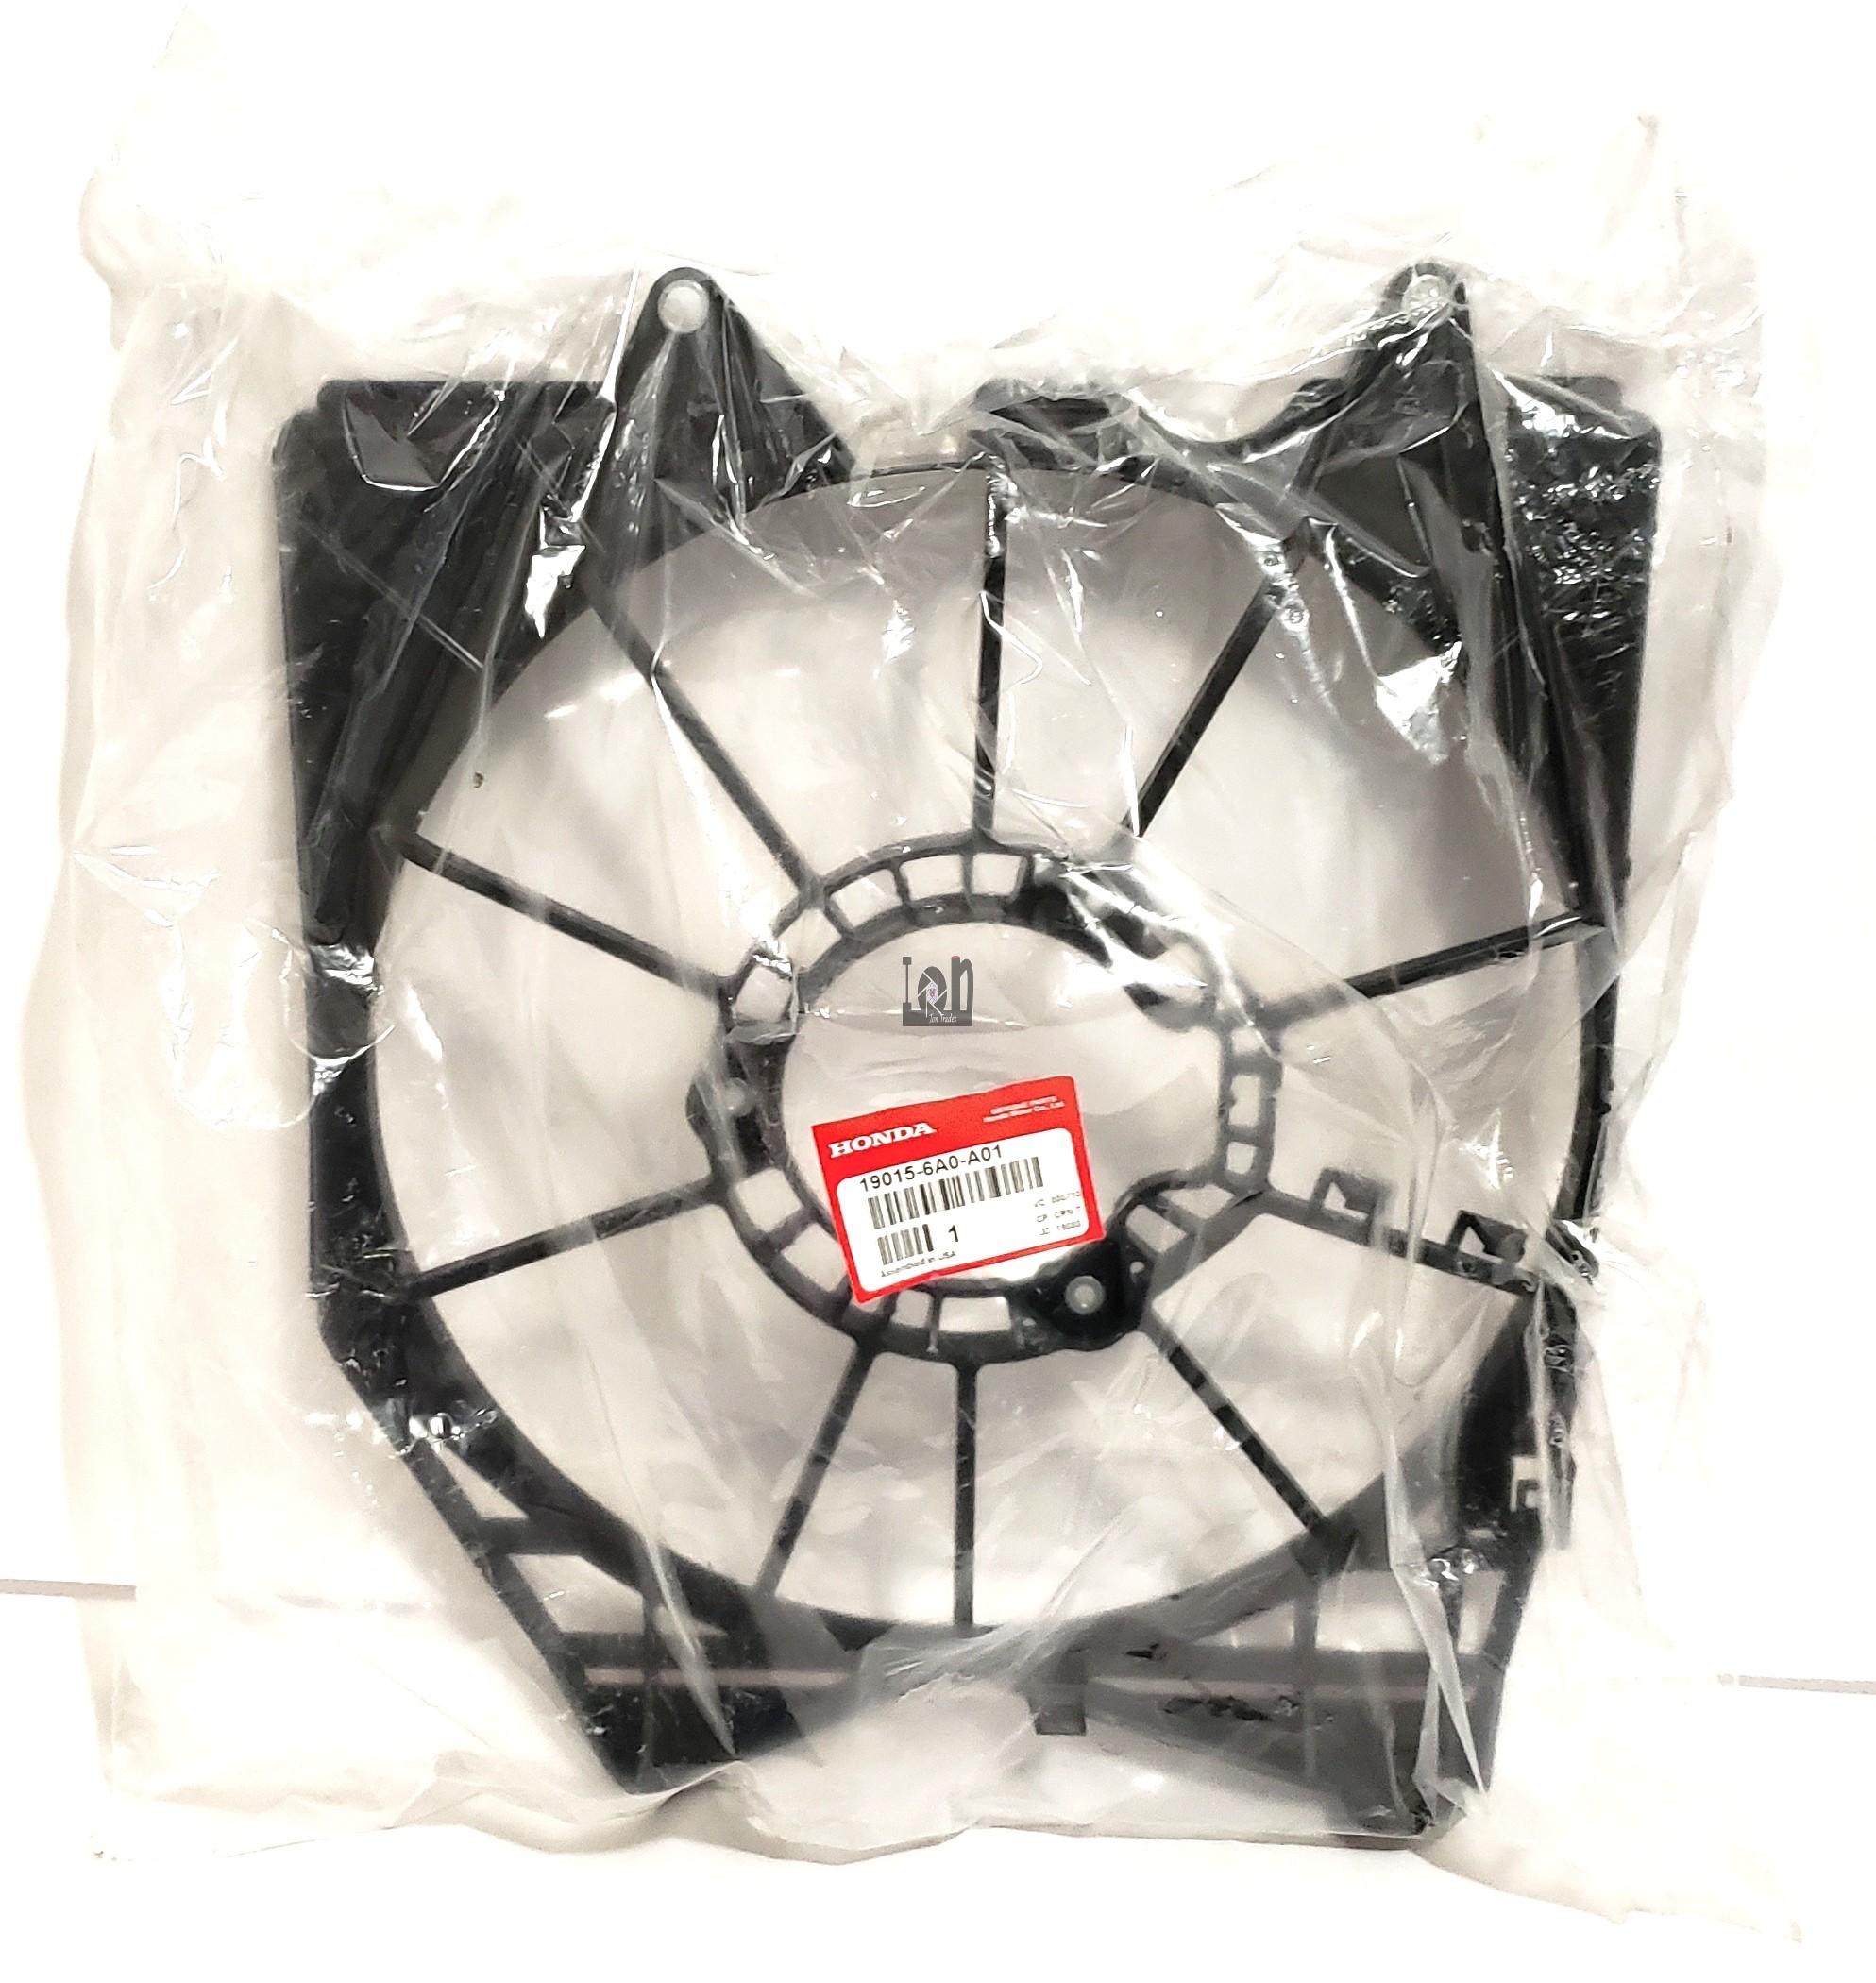 Honda Accord Shroud Radiator Cowling  Shroud 19015-6A0-A01 OEM 2018 2019 Parts